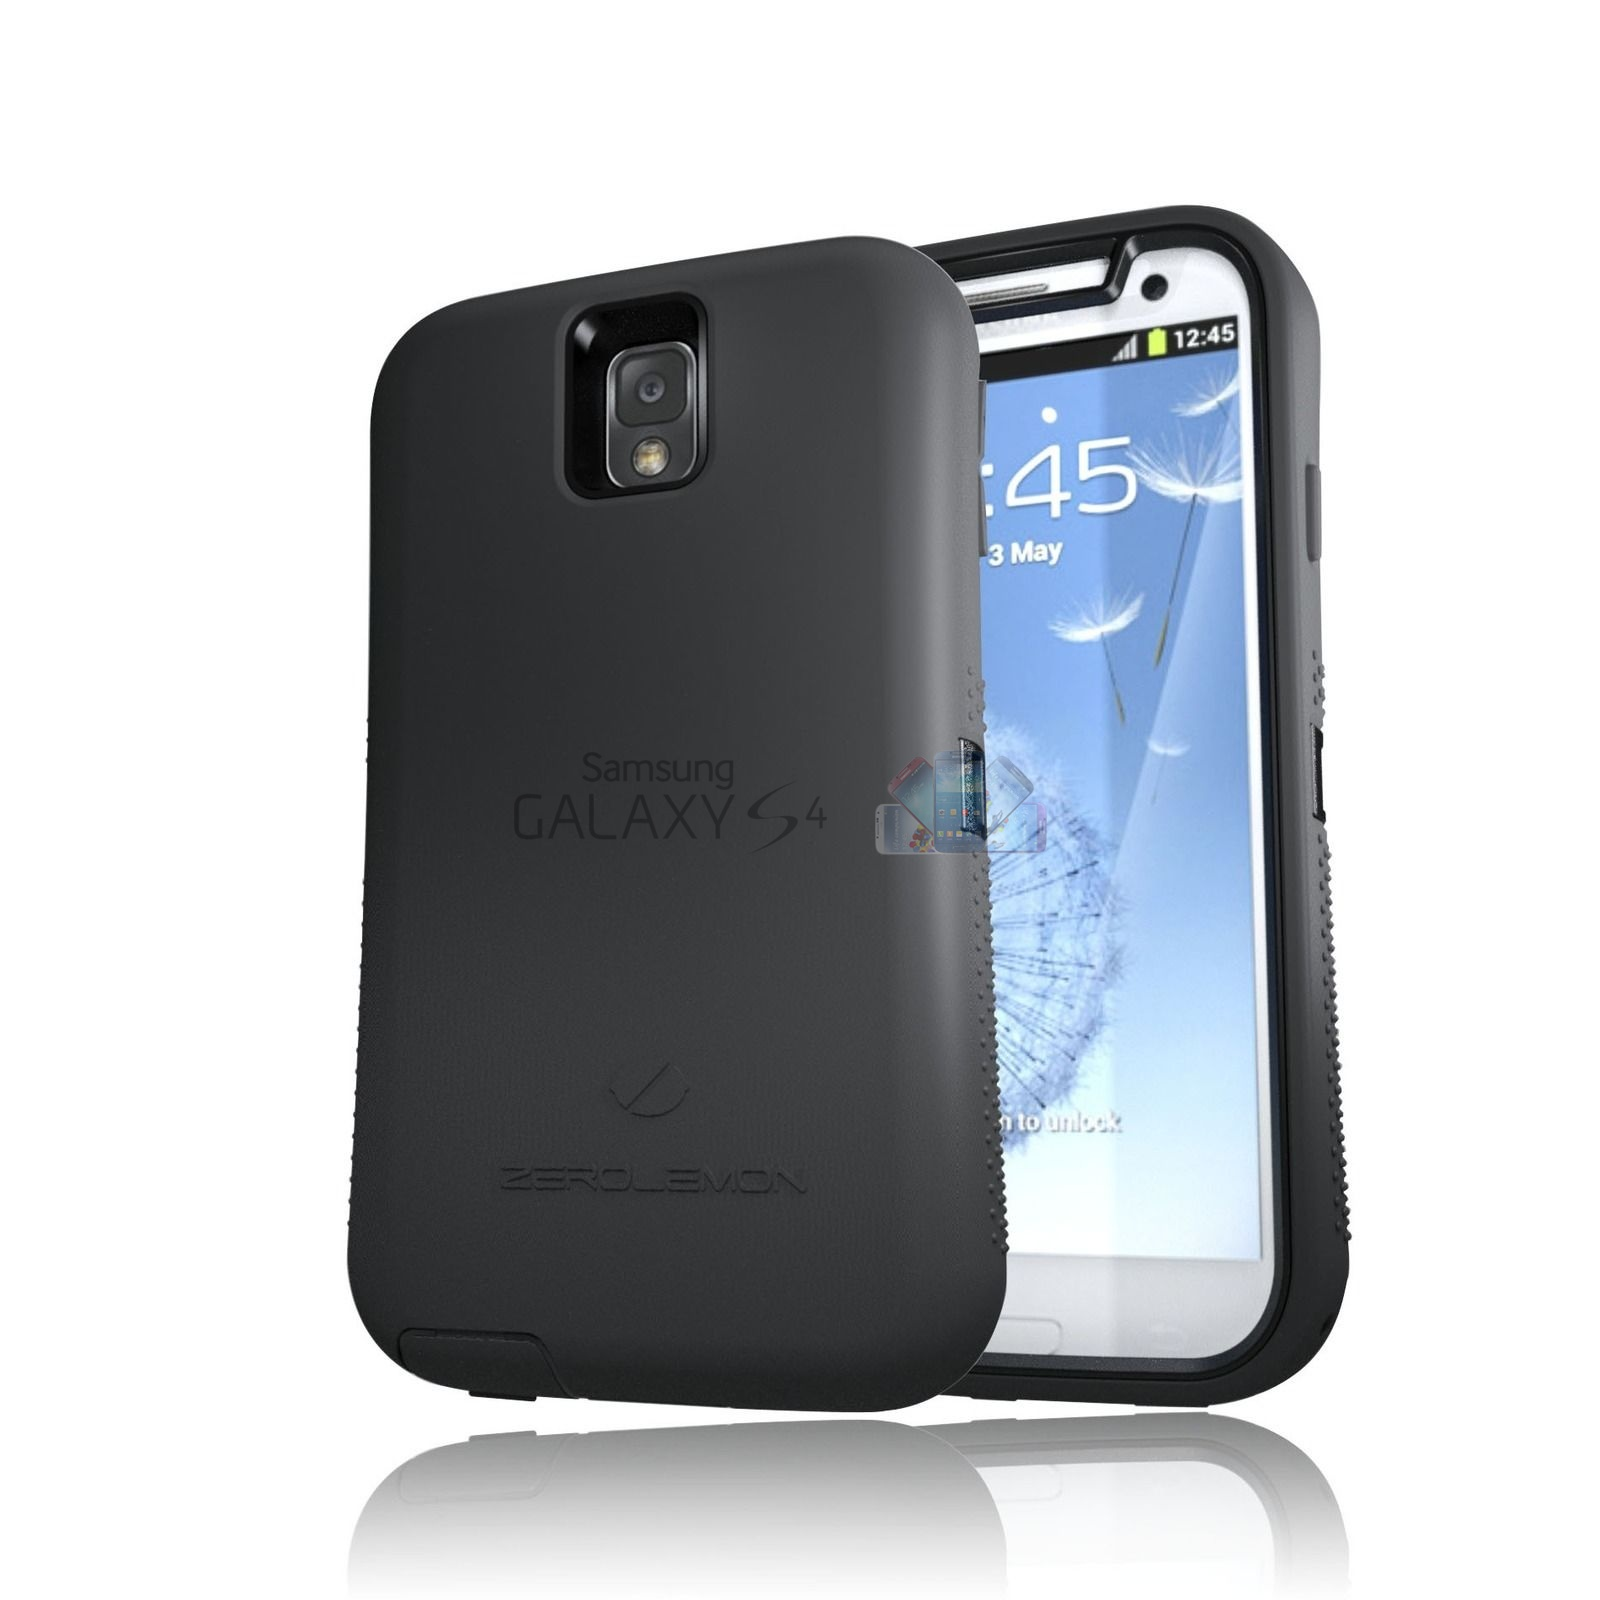 Батарея ZeroLemon на 10000 мАч на Galaxy Note 3